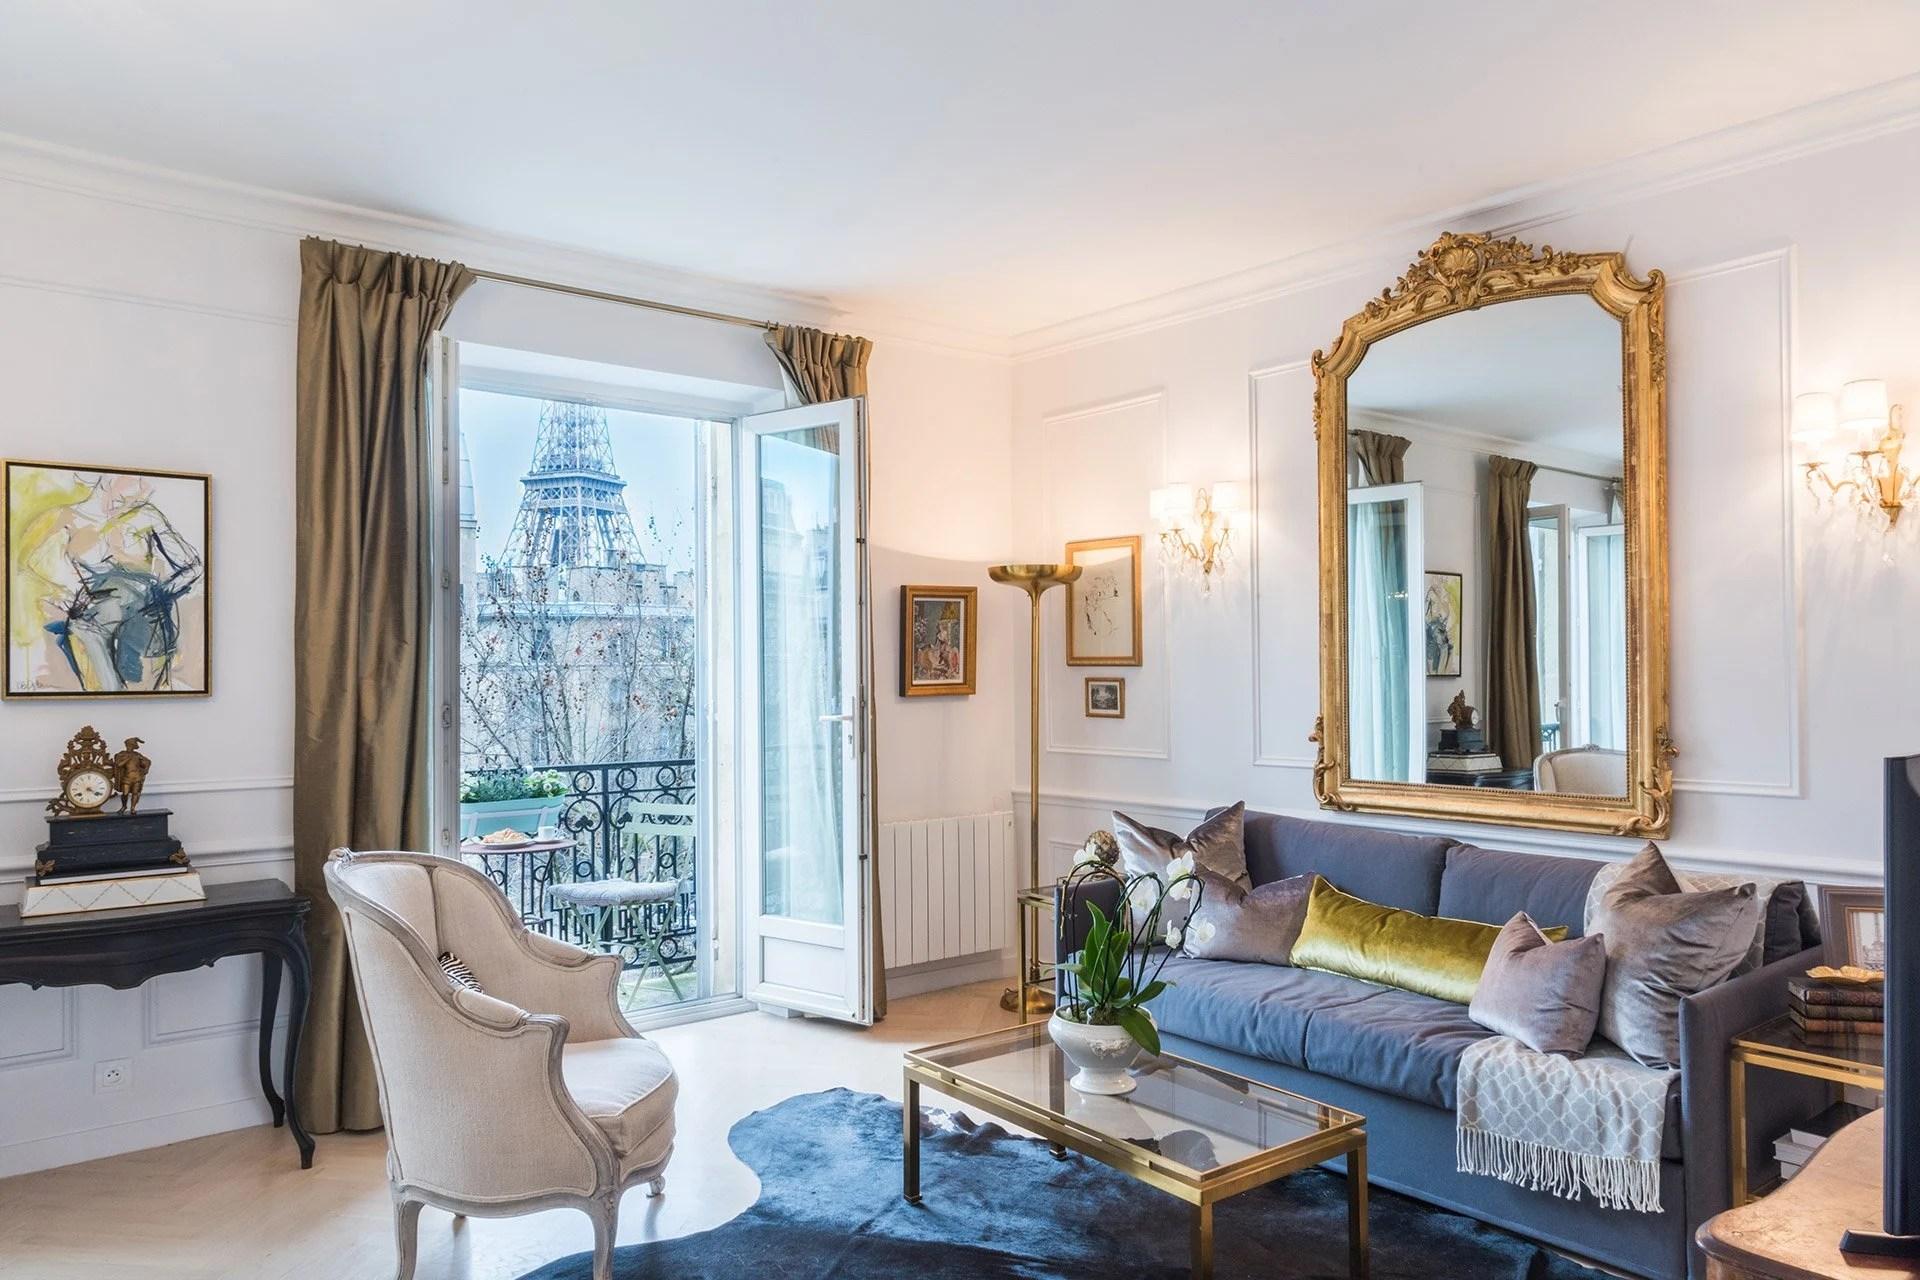 Best Kitchen Gallery: Fractional Paris Apartment Luxury Apartment With Incredible Eiffel of Paris Apartment  on rachelxblog.com